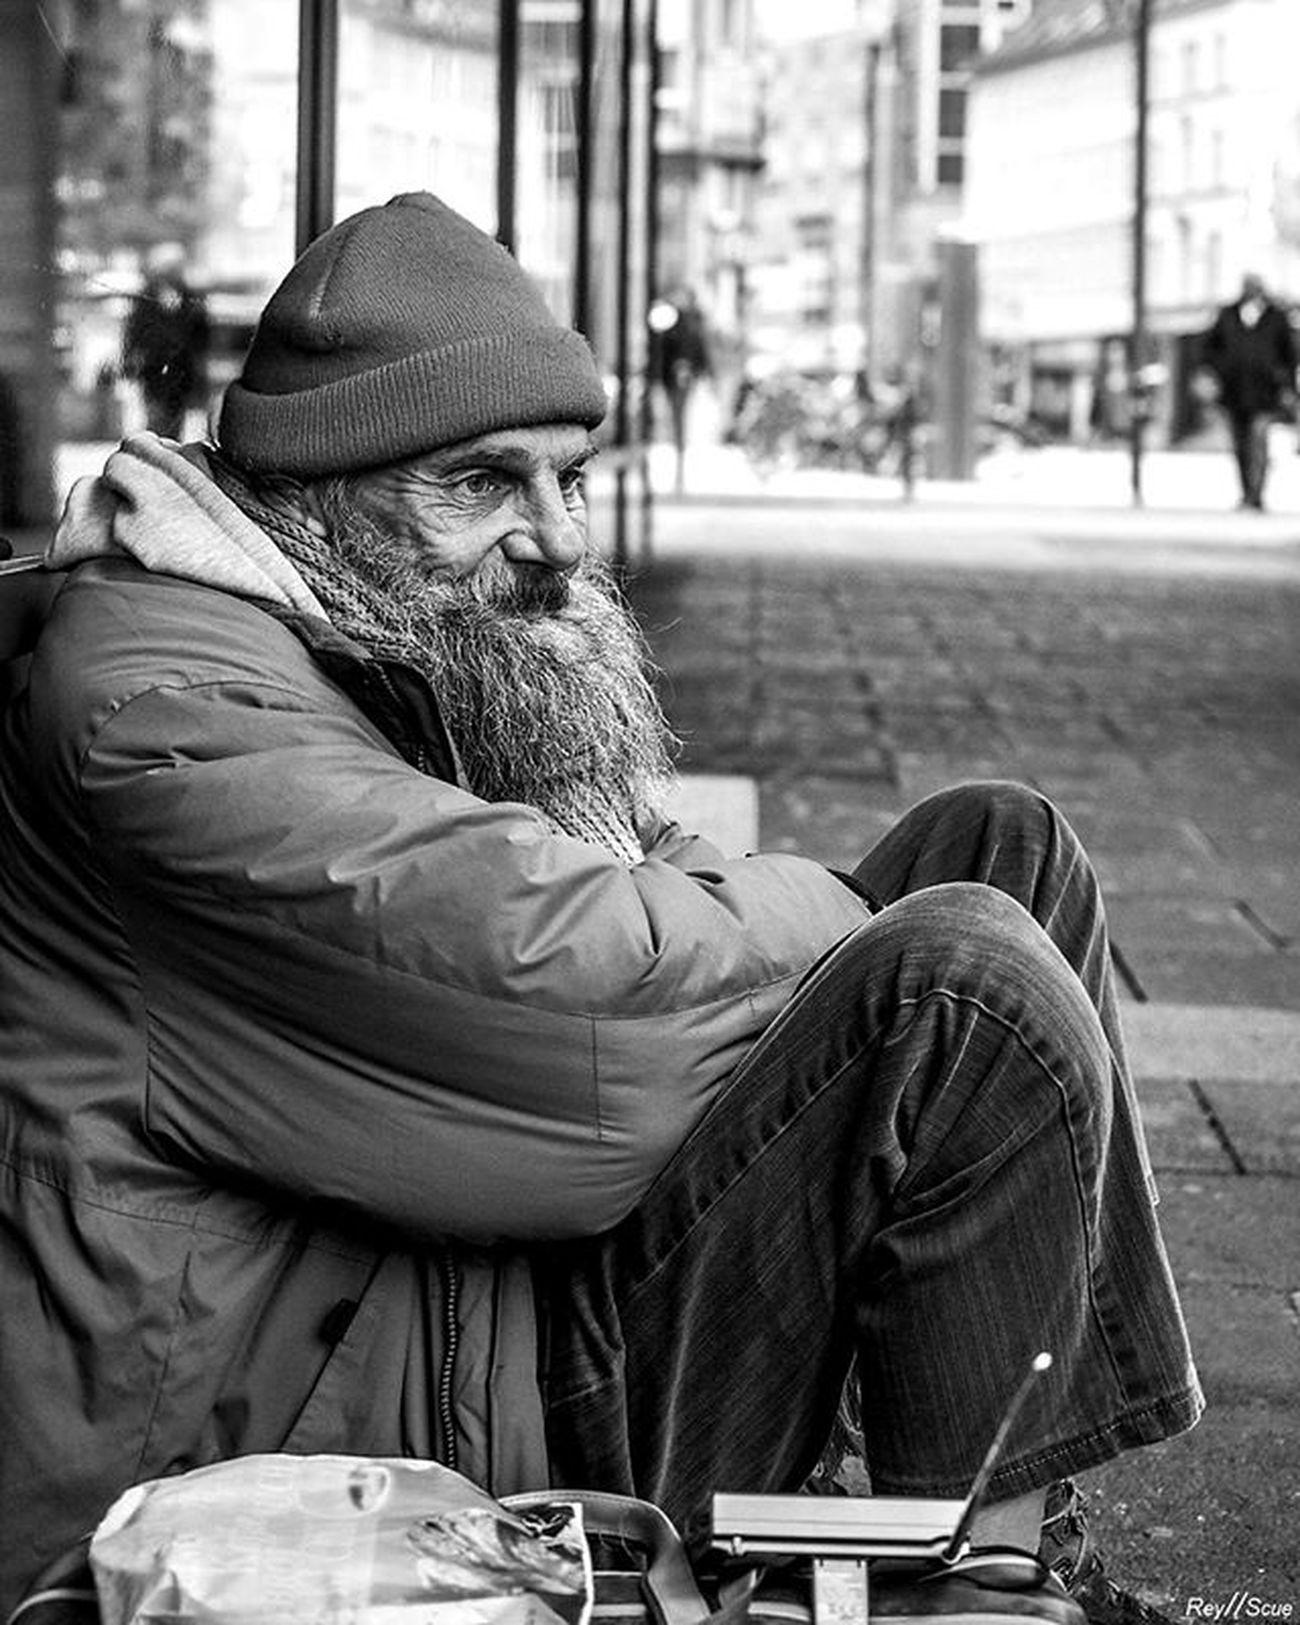 SeparateLife Reyscue Street Moments Frankfurt Germany Sad Social Documentary Homeless People Olympus Mft Pictureoftheday Picoftheday Bestoftheday Instagood Photoof Bw_street White Black Travel Artist Nonprofit Old Urban shadows world bw sadness humanrights